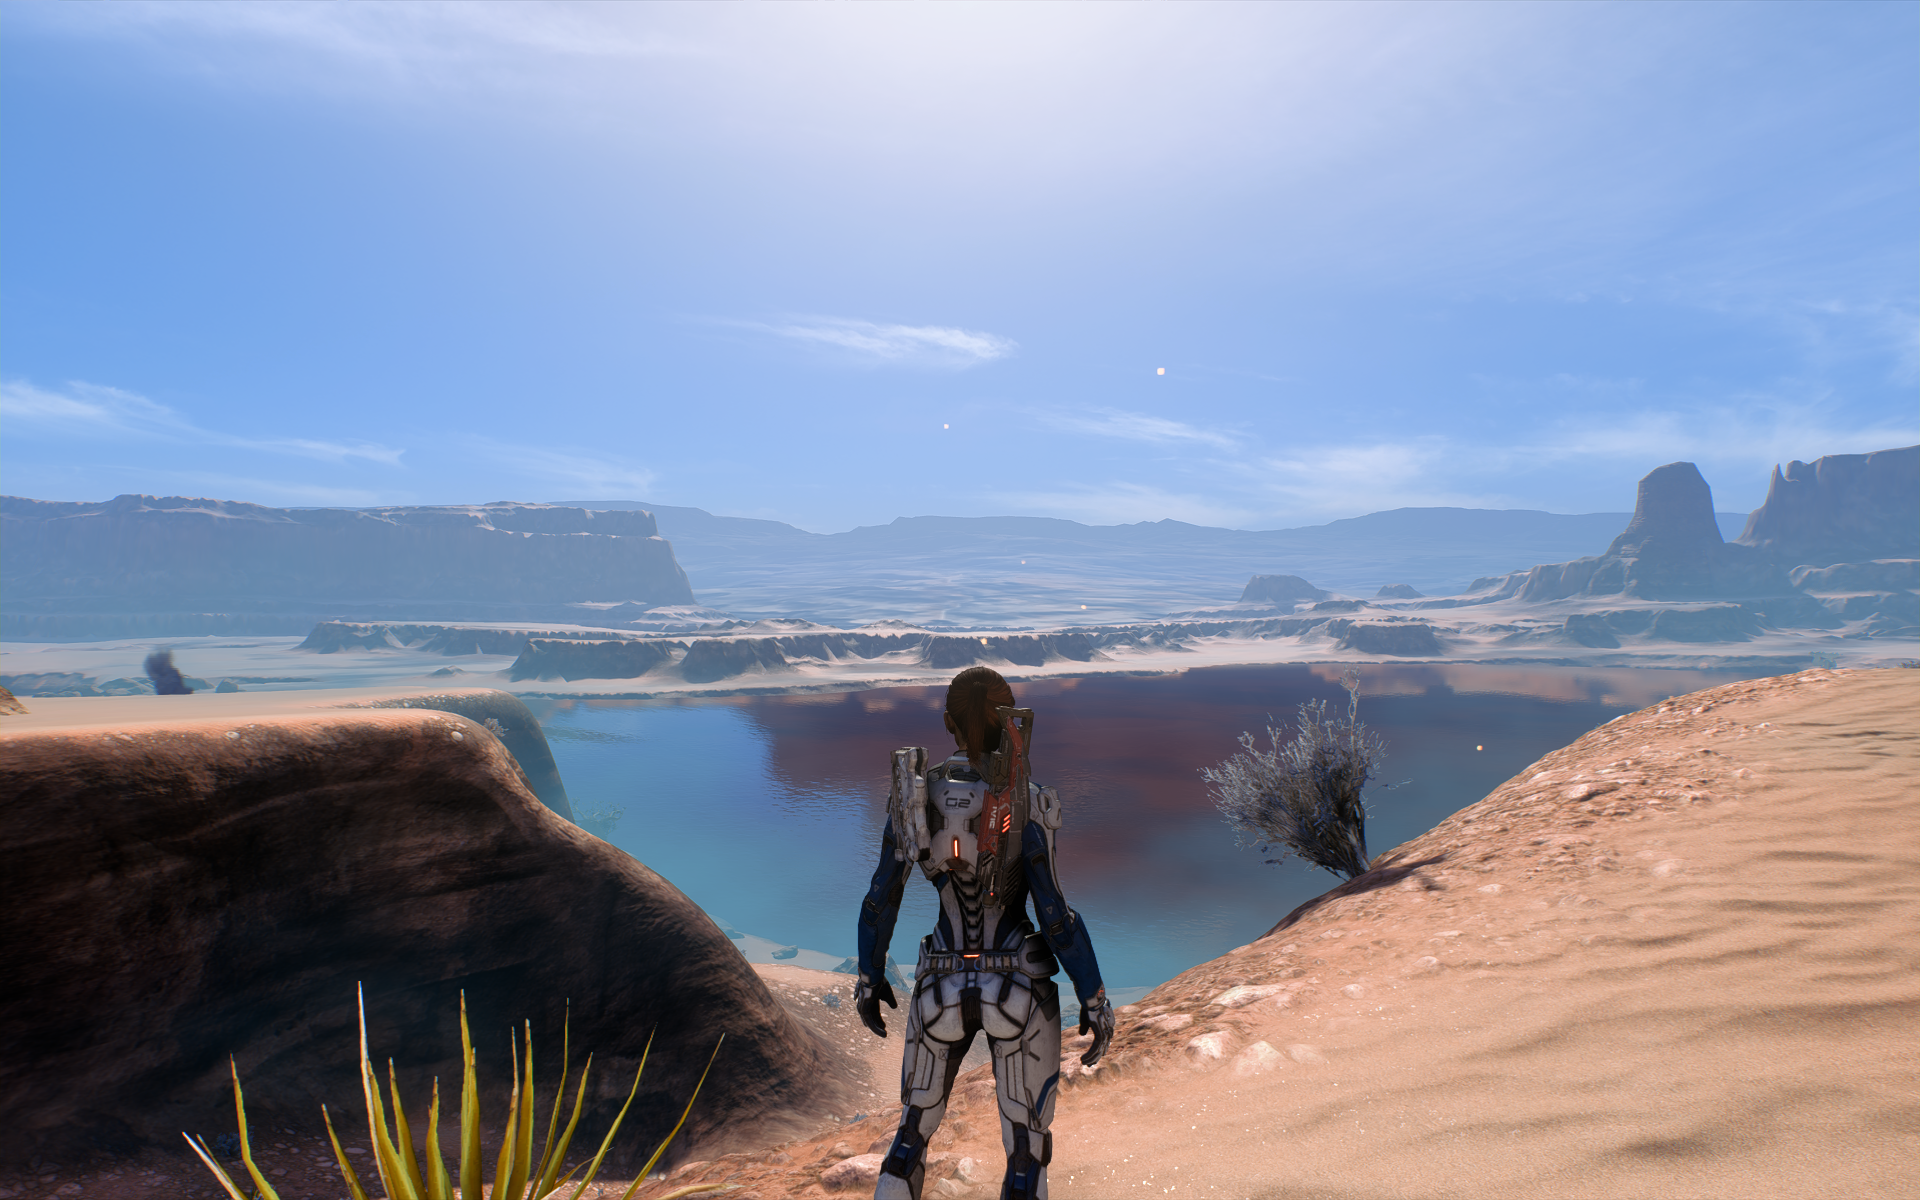 Mass Effect Andromeda Screenshot - 06.49.33.42.png - Mass Effect: Andromeda